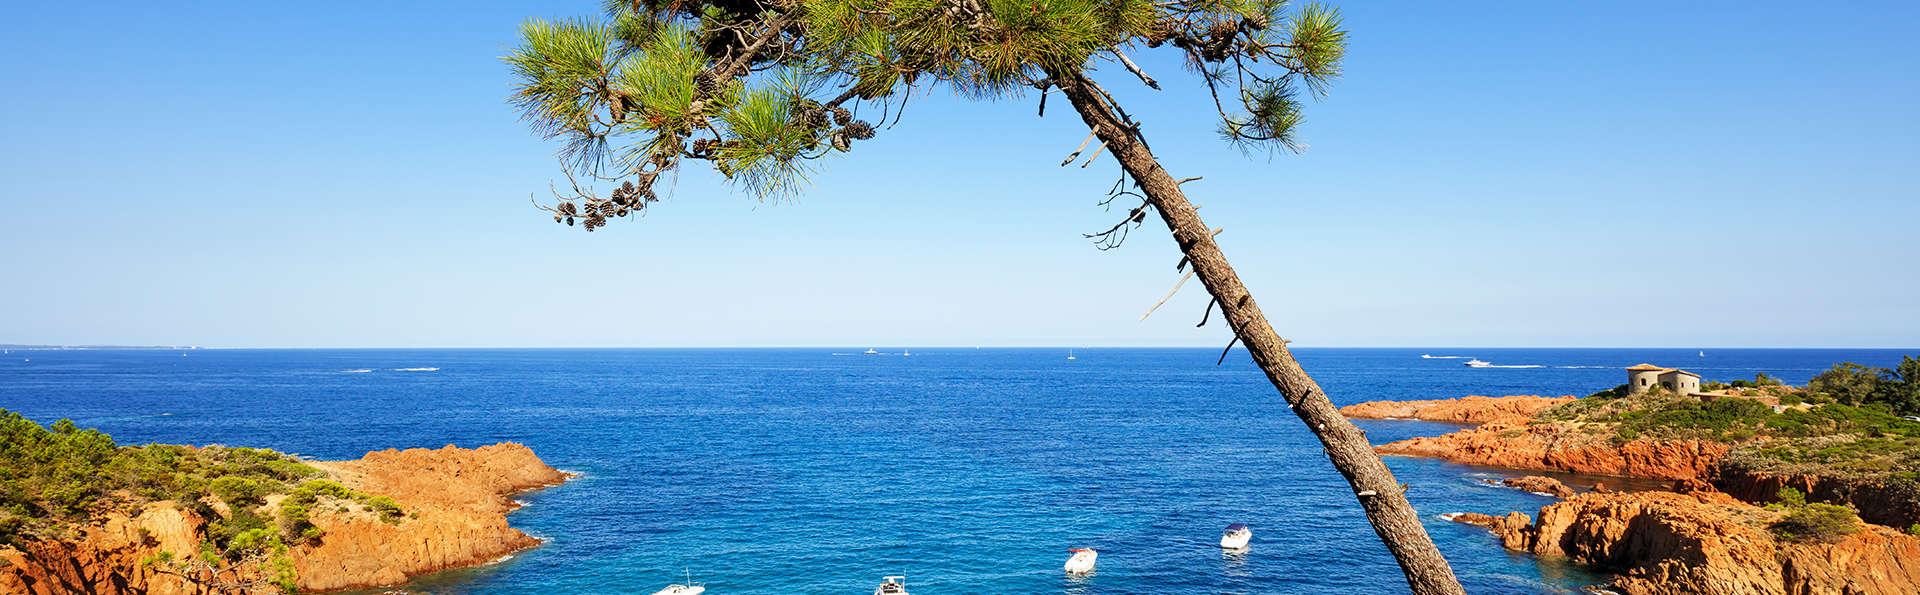 Le Cannes Palace - Edit_Cannes.jpg